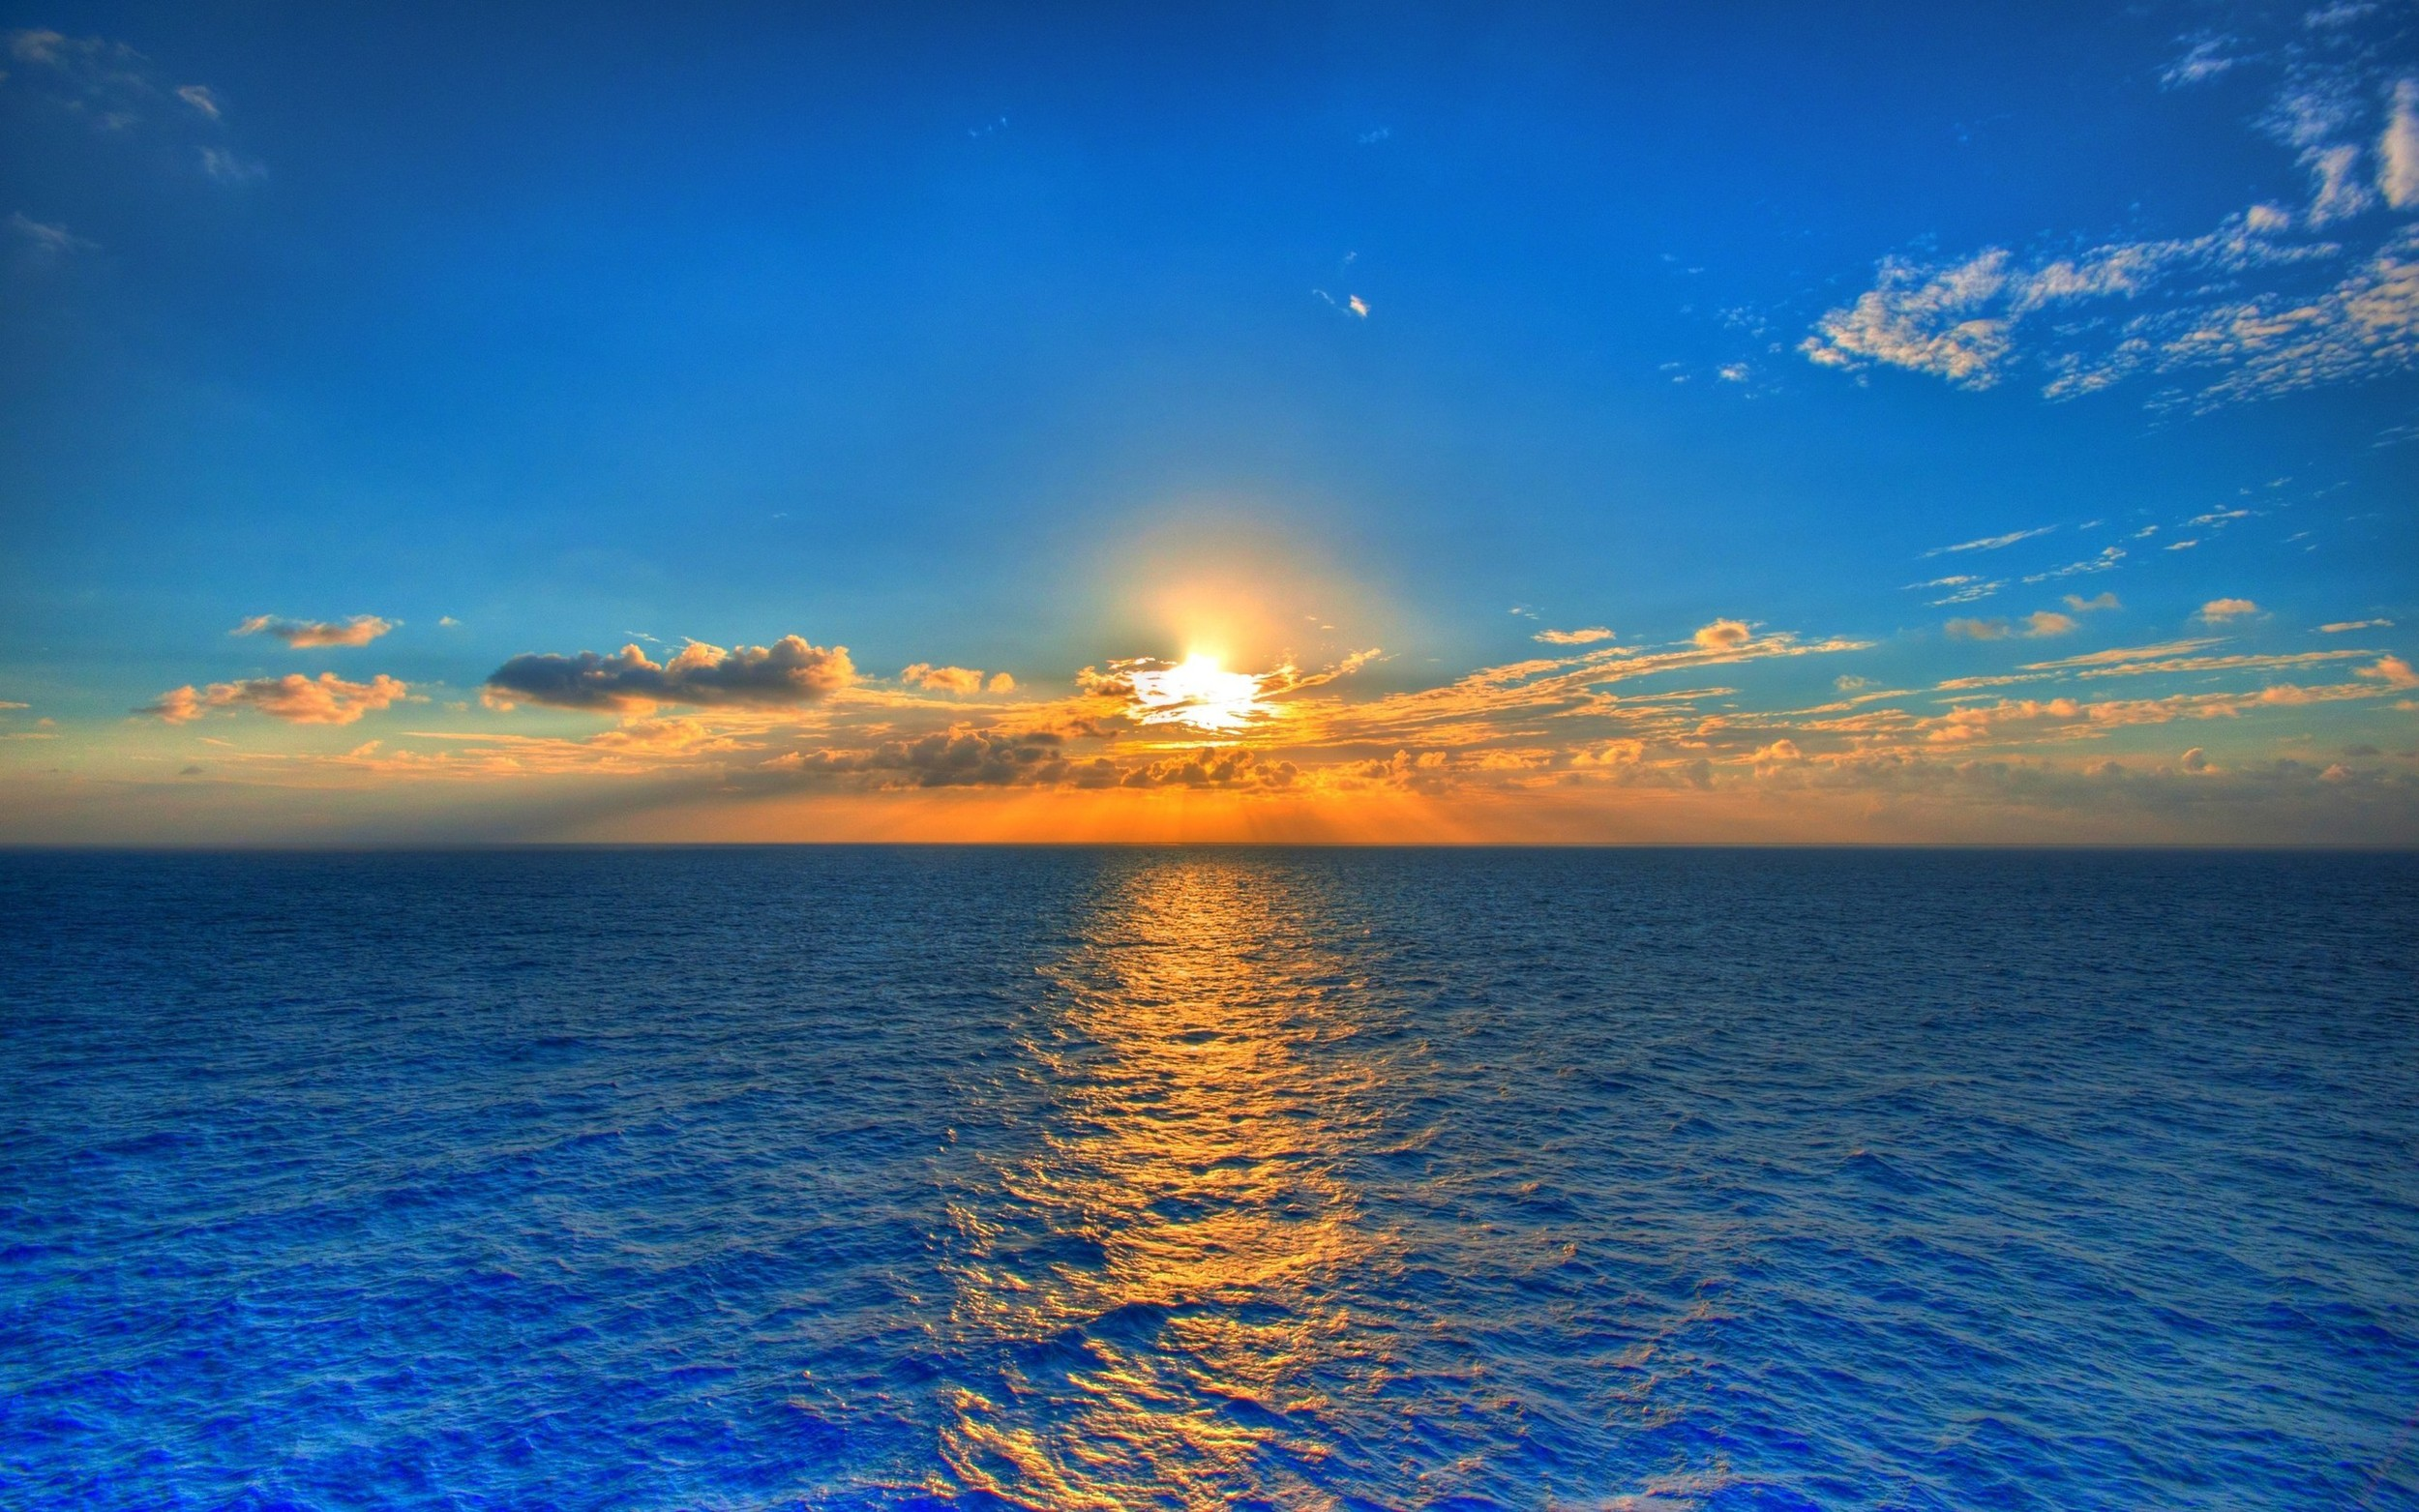 sunset on blue sea water.jpg